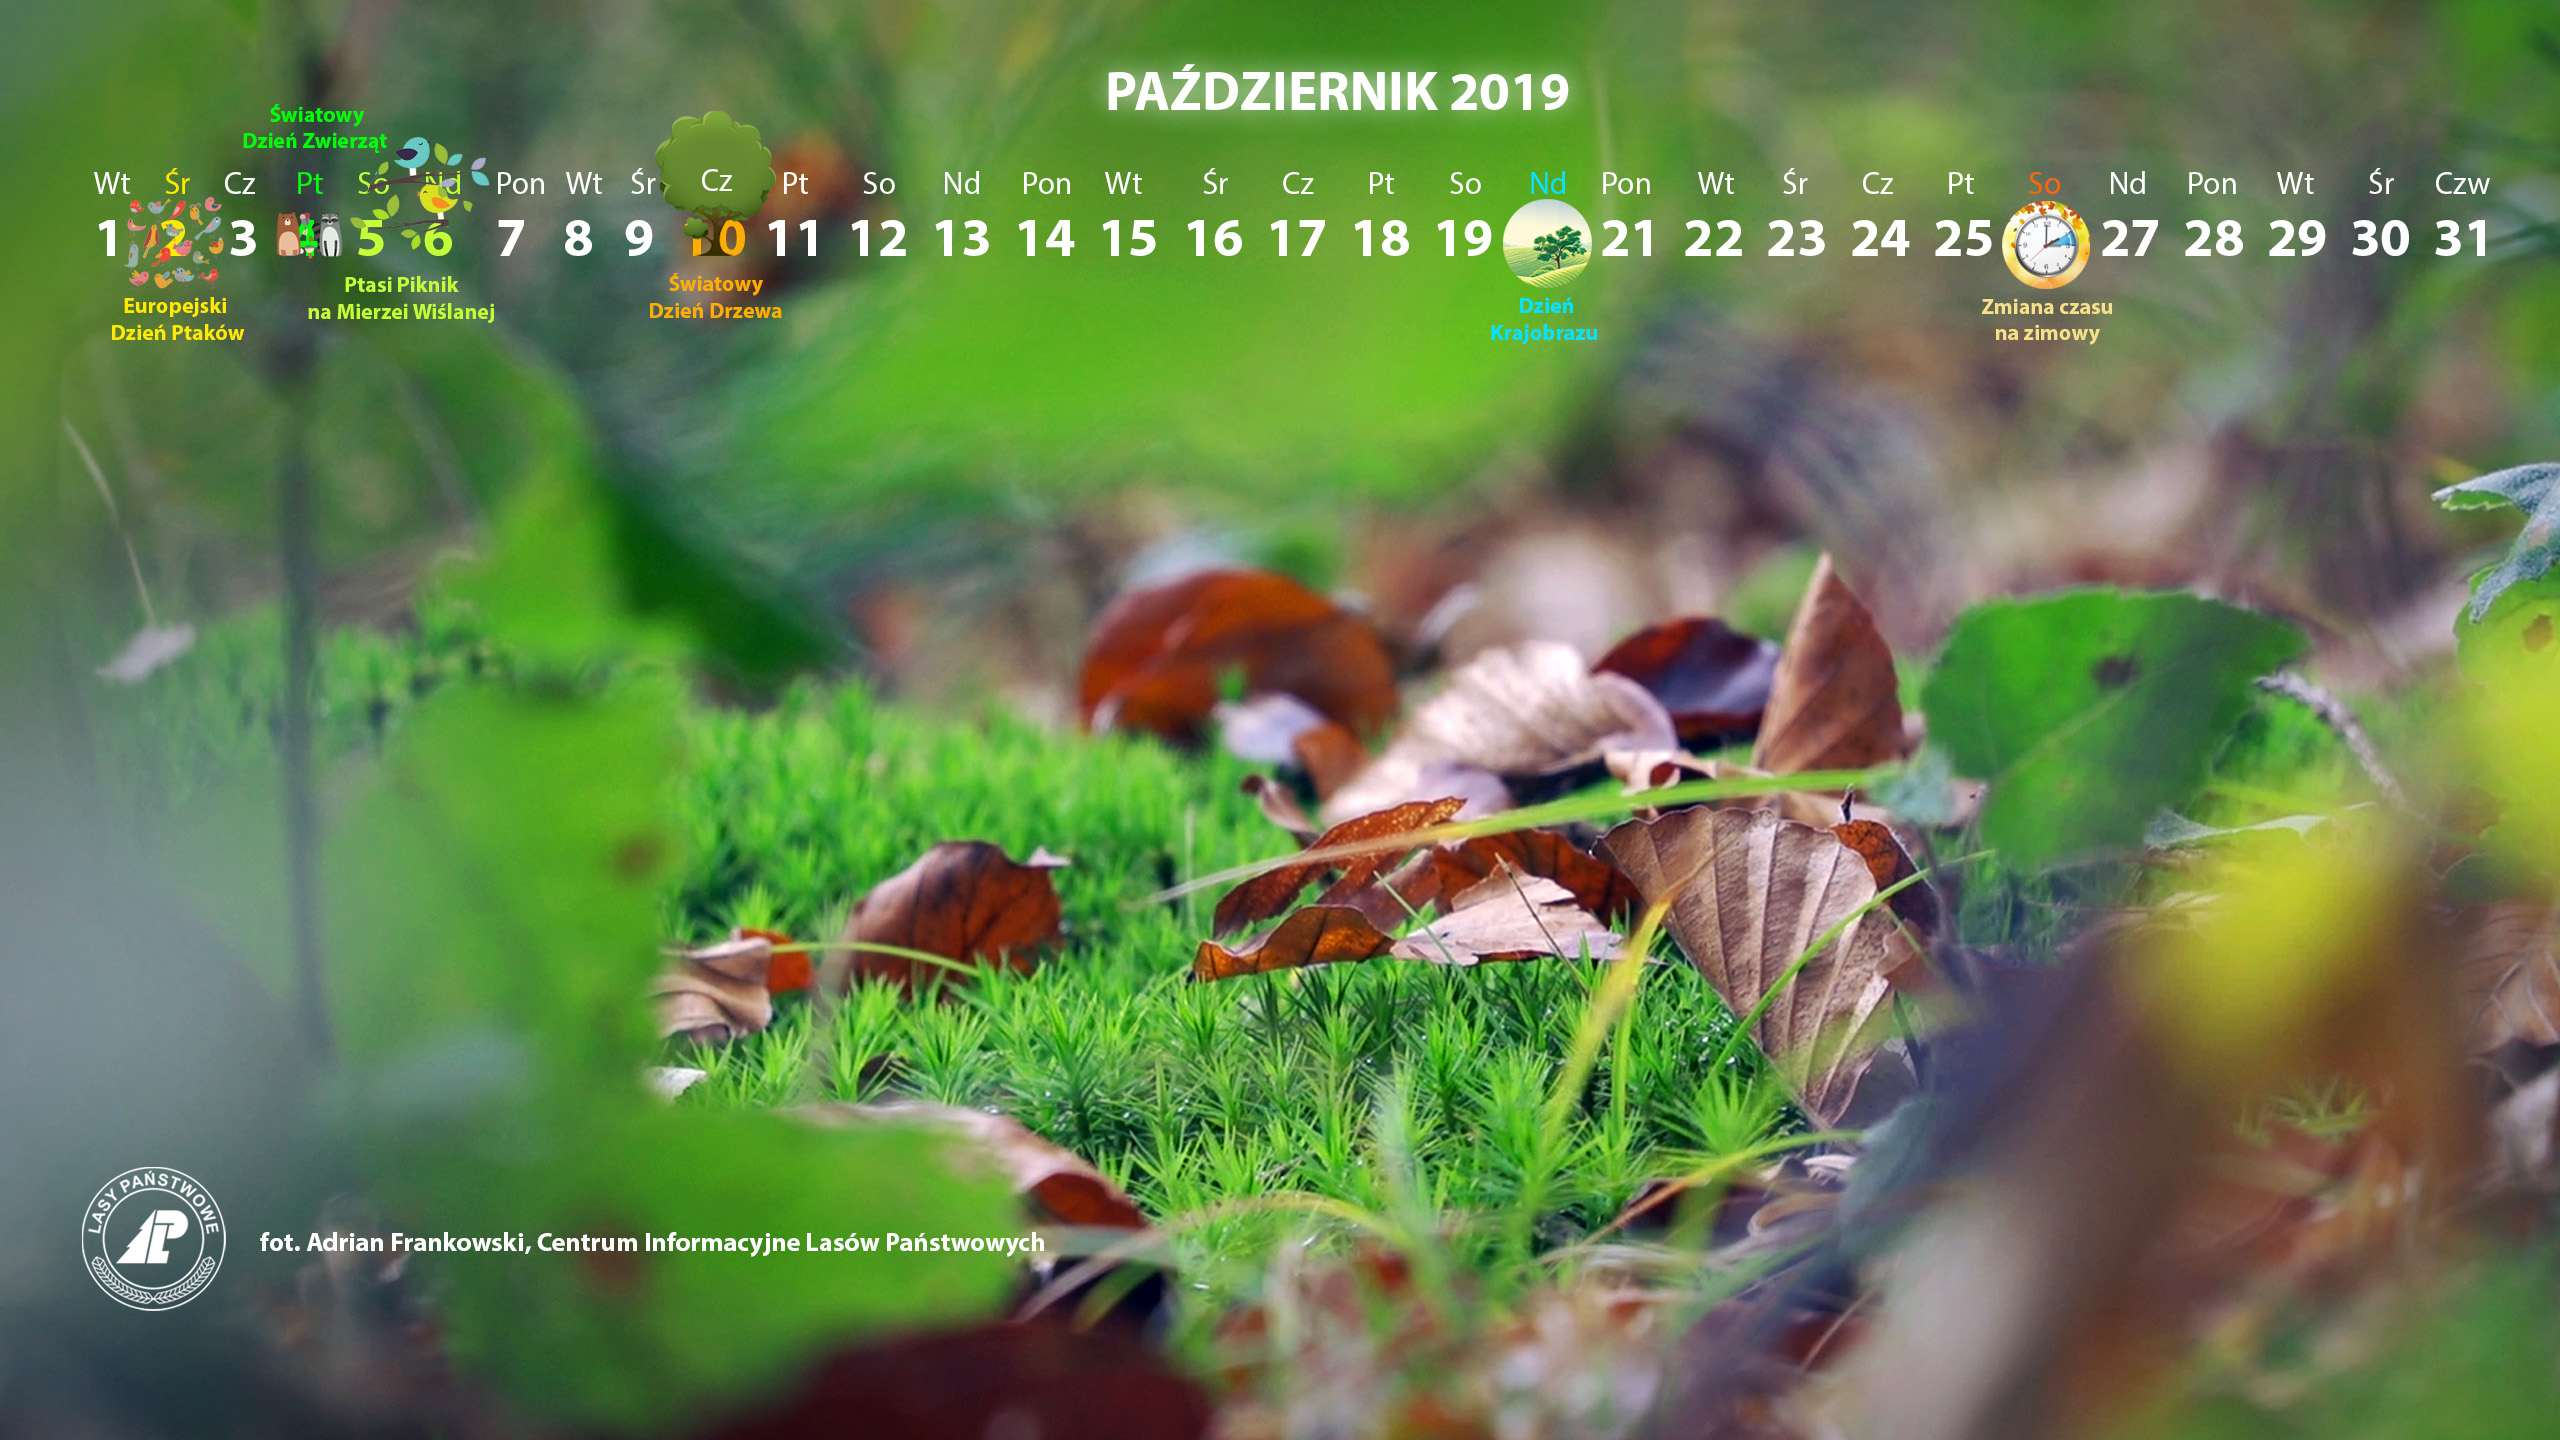 Kalendarz_październik_2019_2560x1440[1].jpg